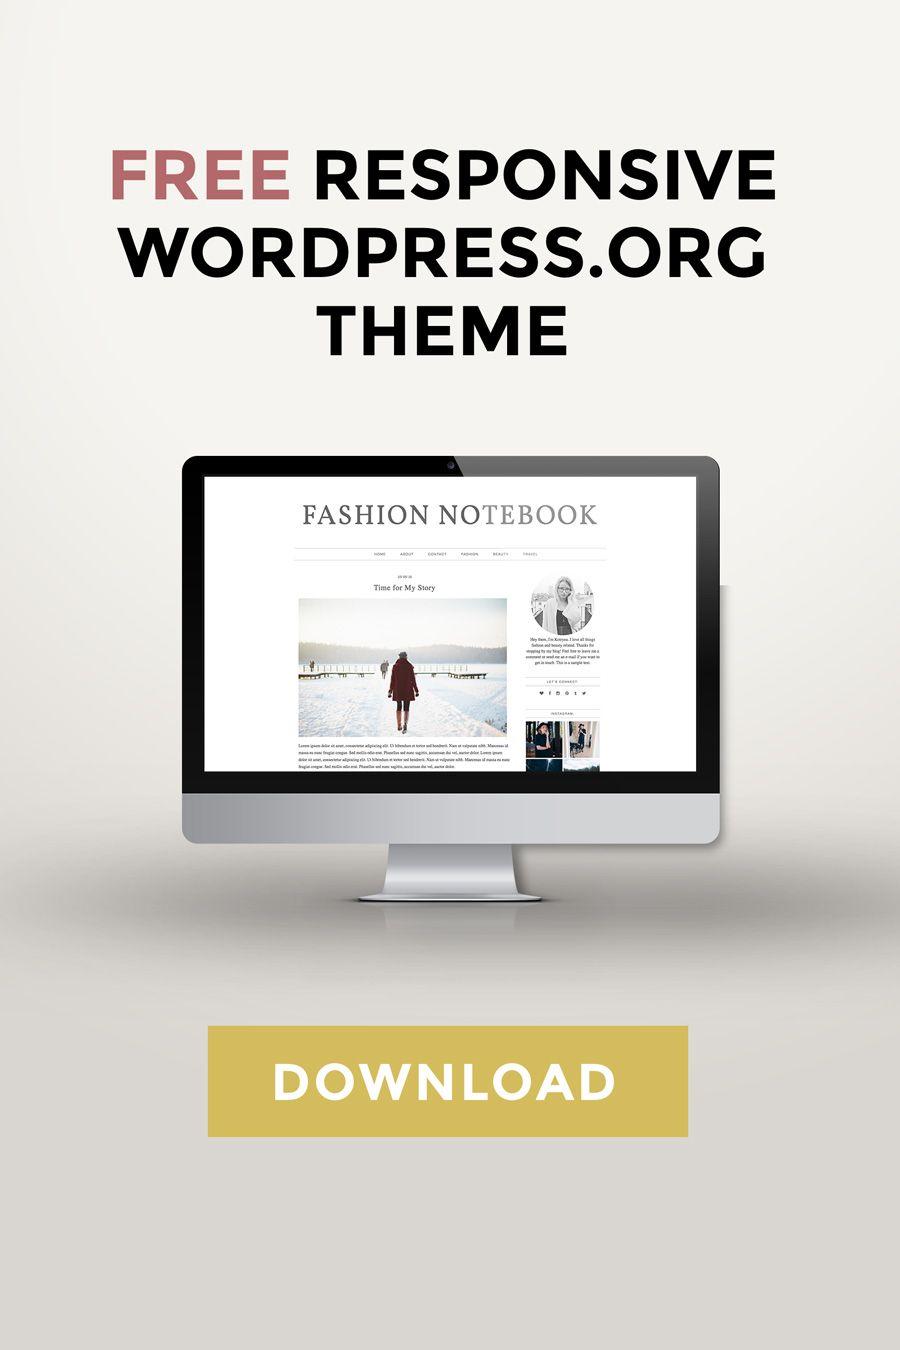 Free Wordpress Theme Download Lifestyle Blog Entrepreneur Blogging Tips Kotryna Bass Blog Themes Wordpress Wordpress Blog Design Free Wordpress Templates